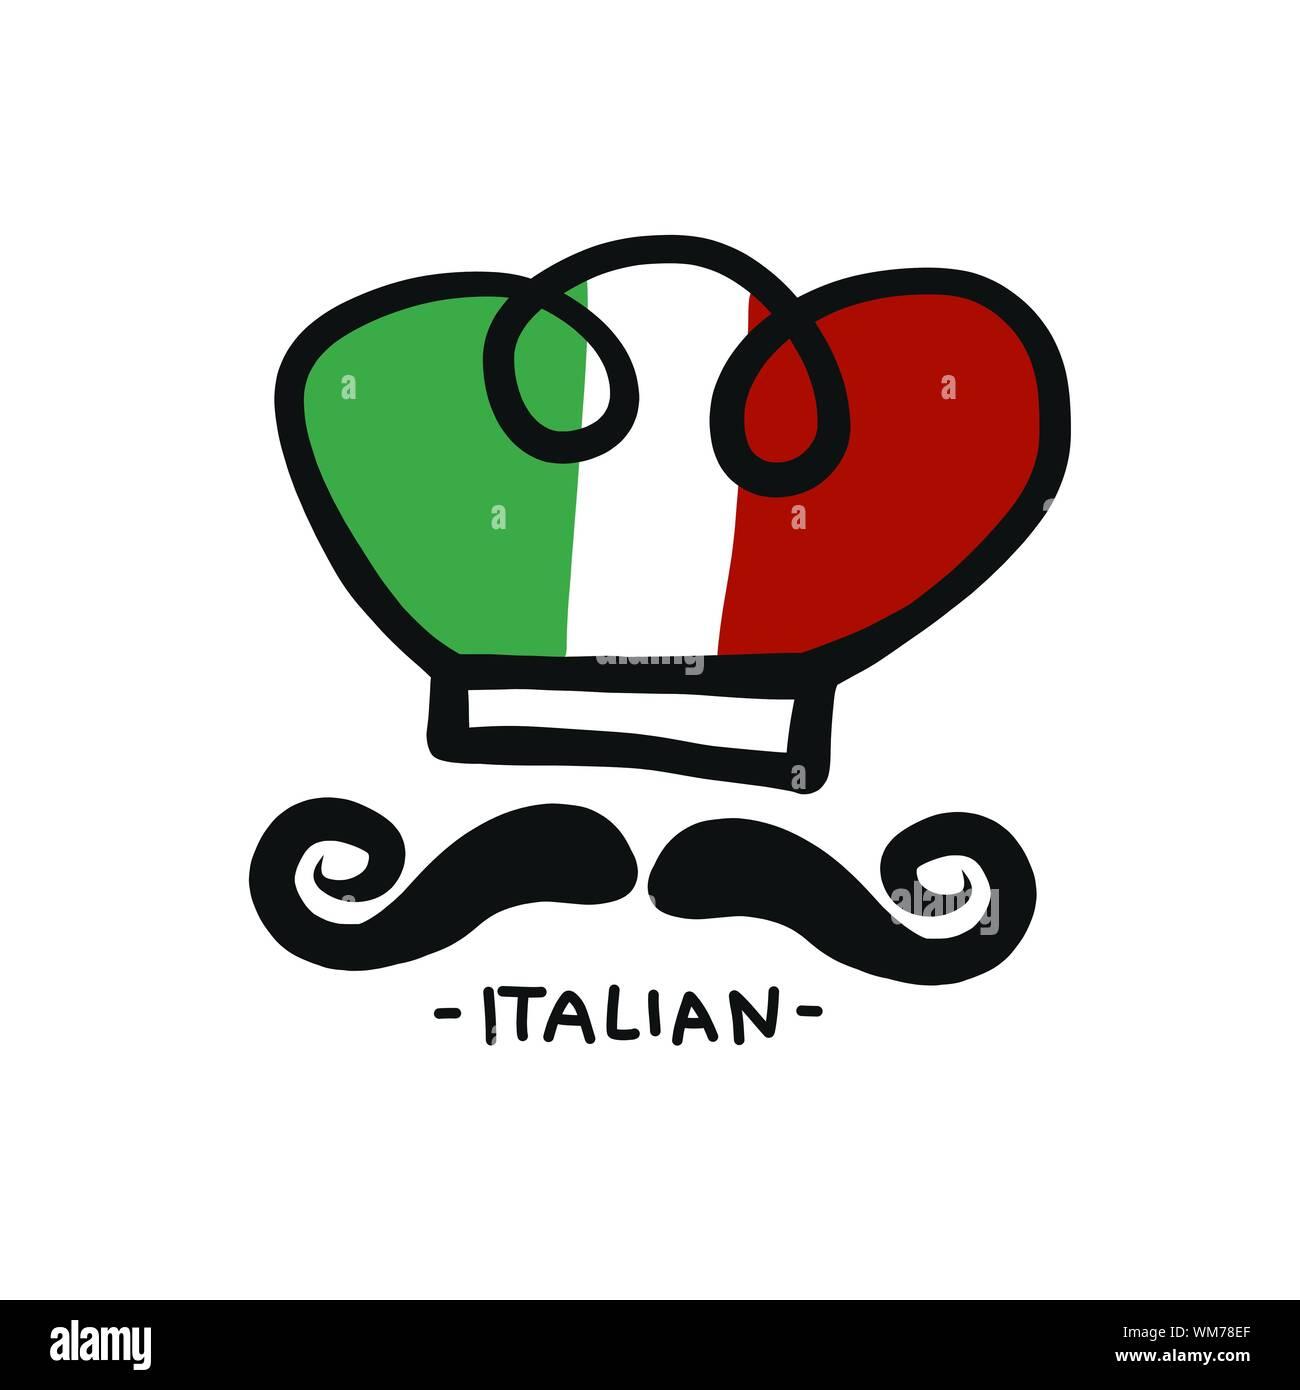 Italian chef hat logo vector illustration Stock Vector